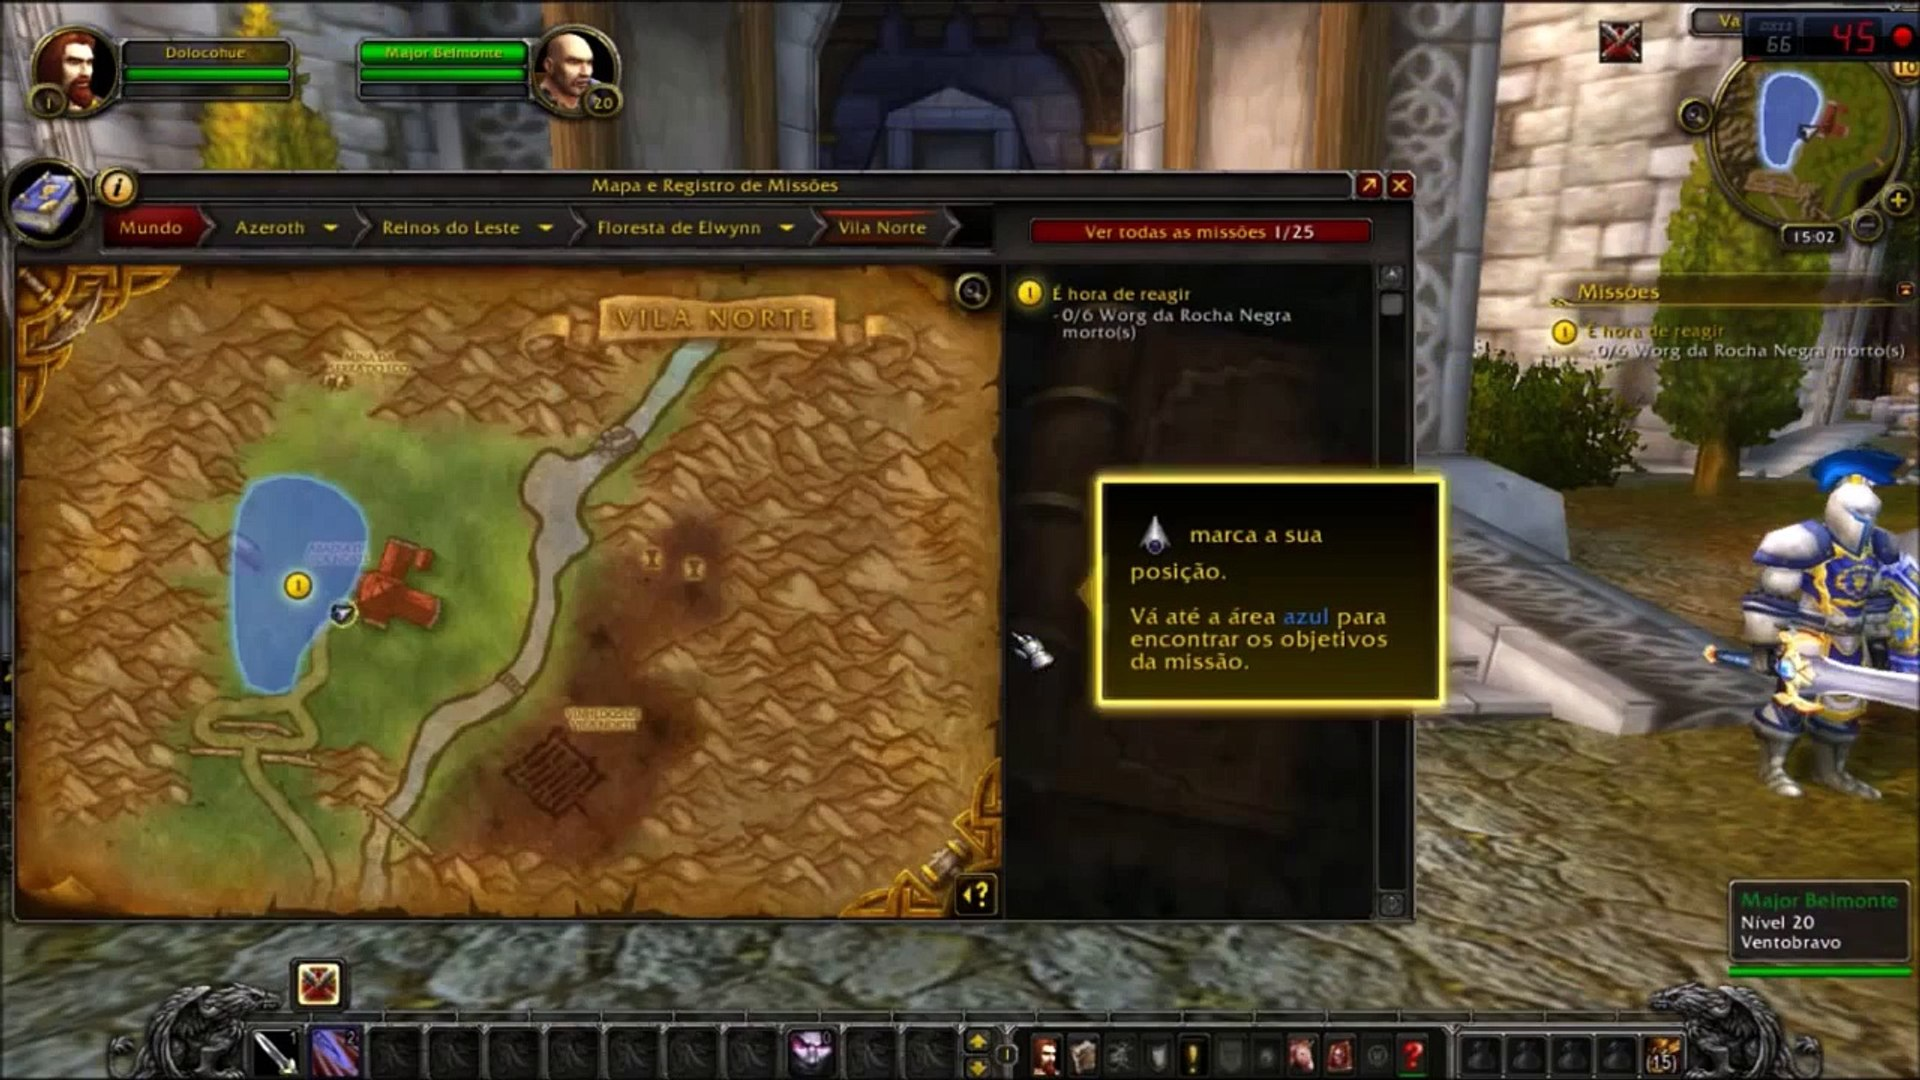 World of Warcraft NVIDIA GEFORCE 820M (2GB)